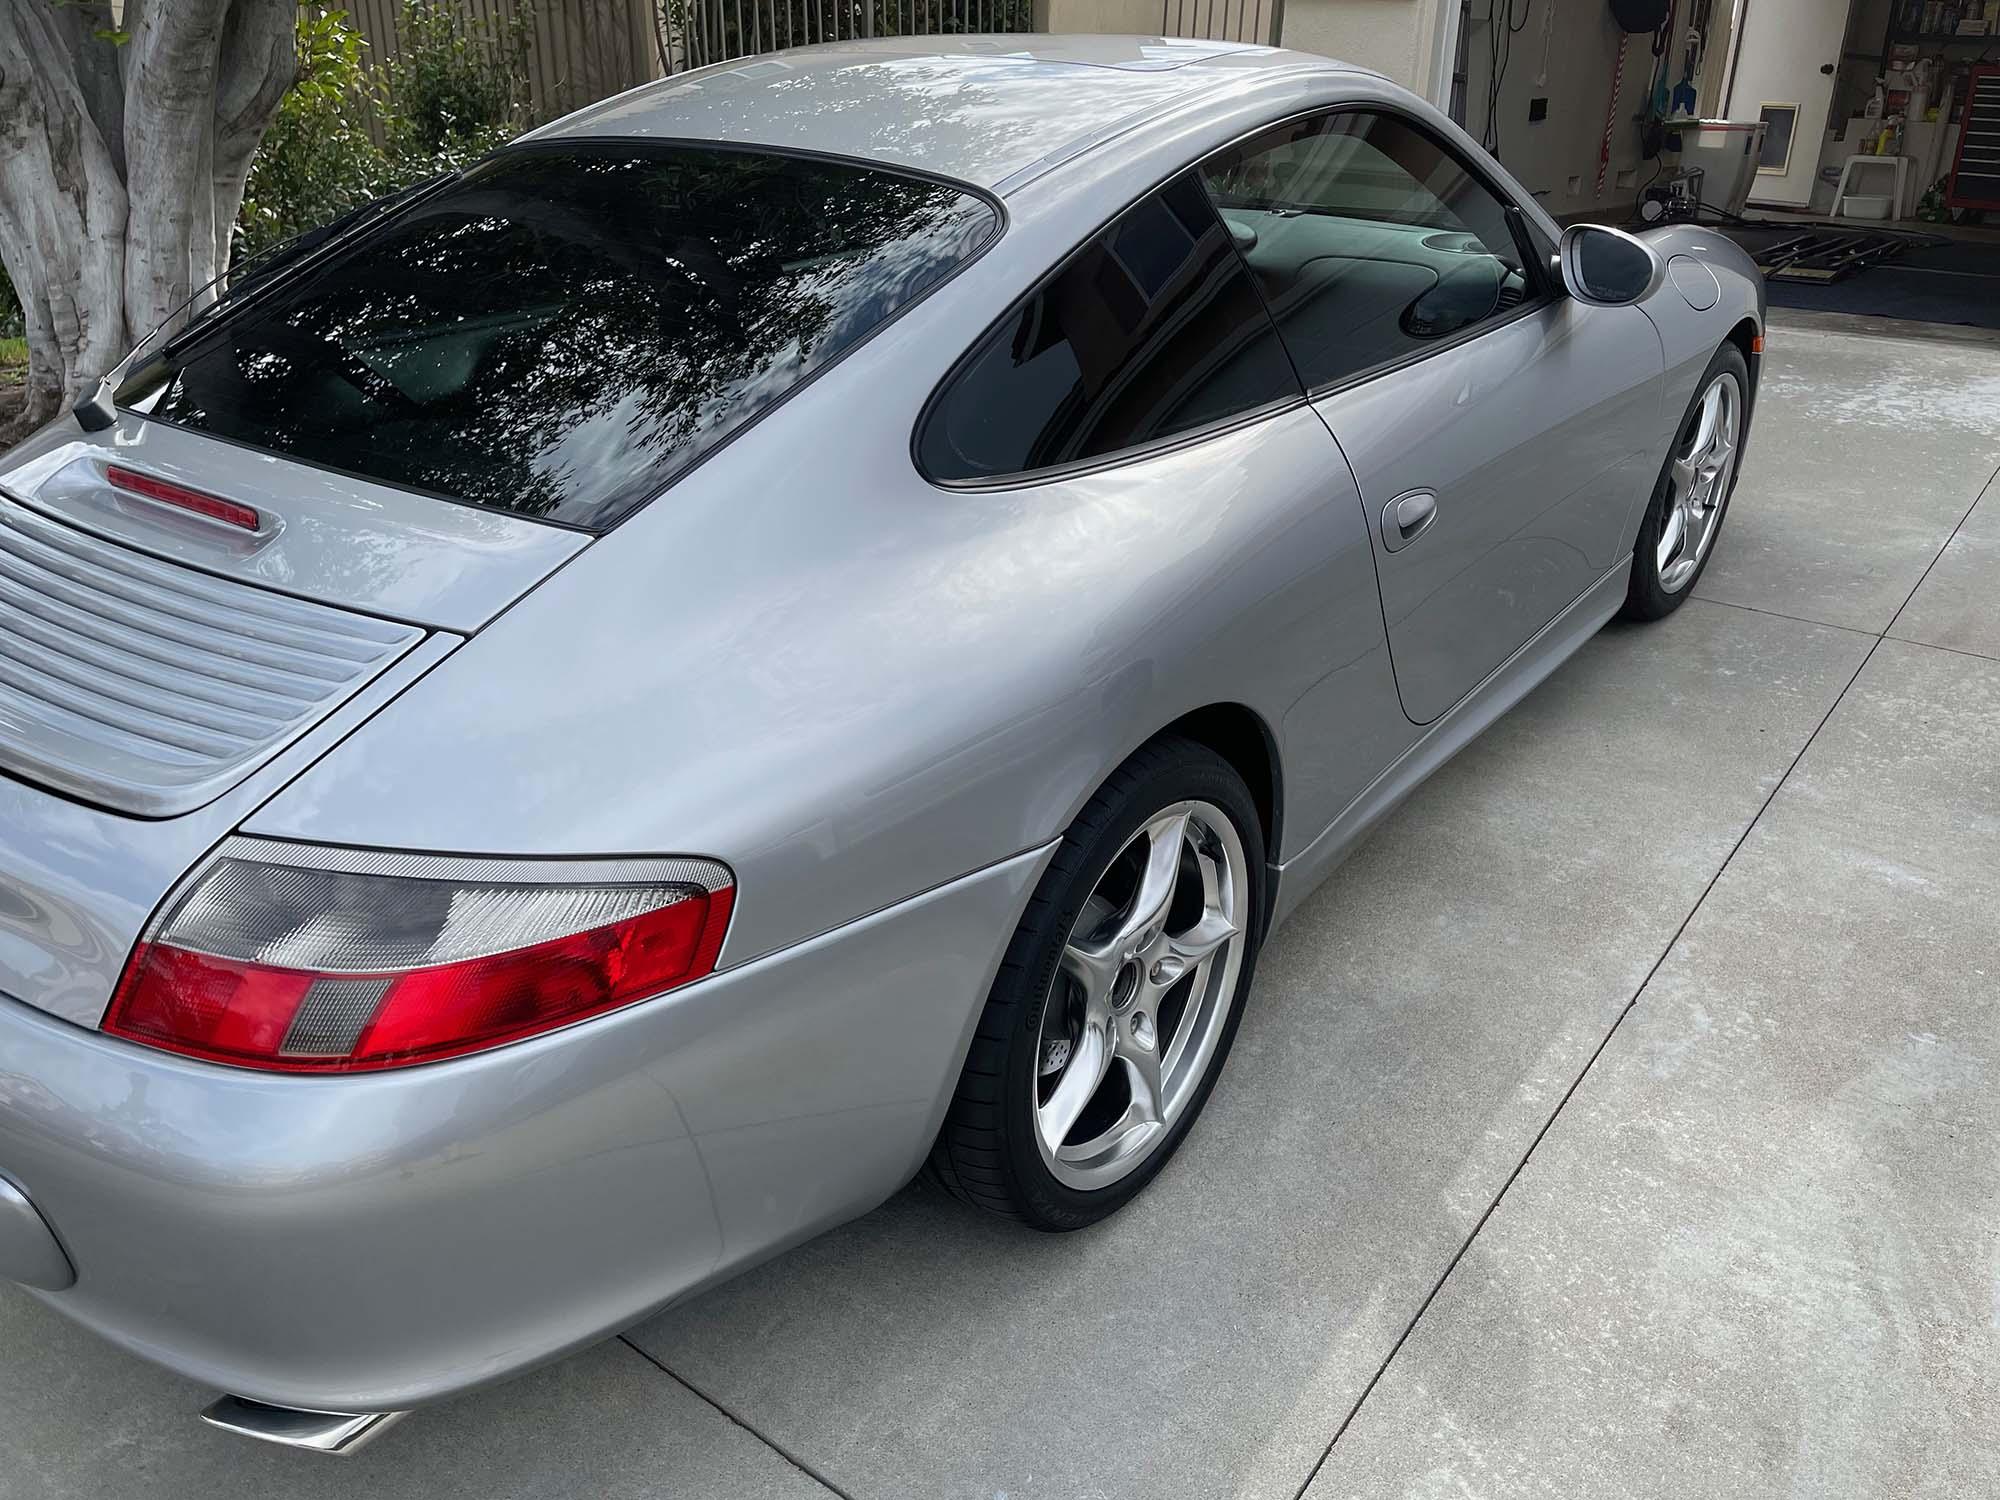 2004 Porsche 911 40 Year Anniversary Coupe